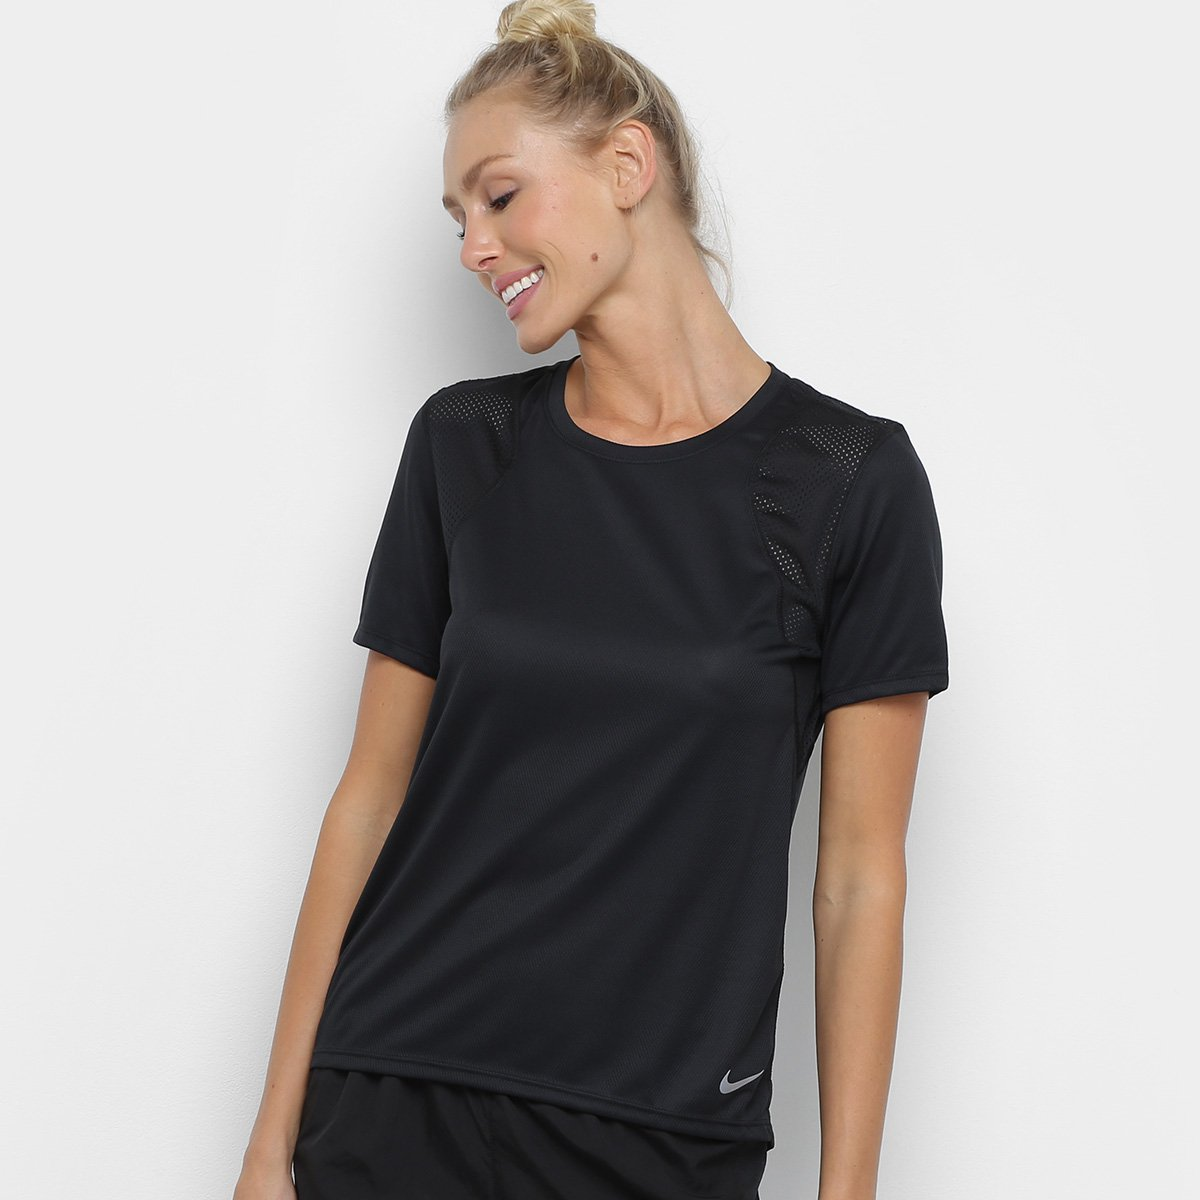 Preto Fit Camiseta Nike Dri Feminina Run eExoWdCQrB